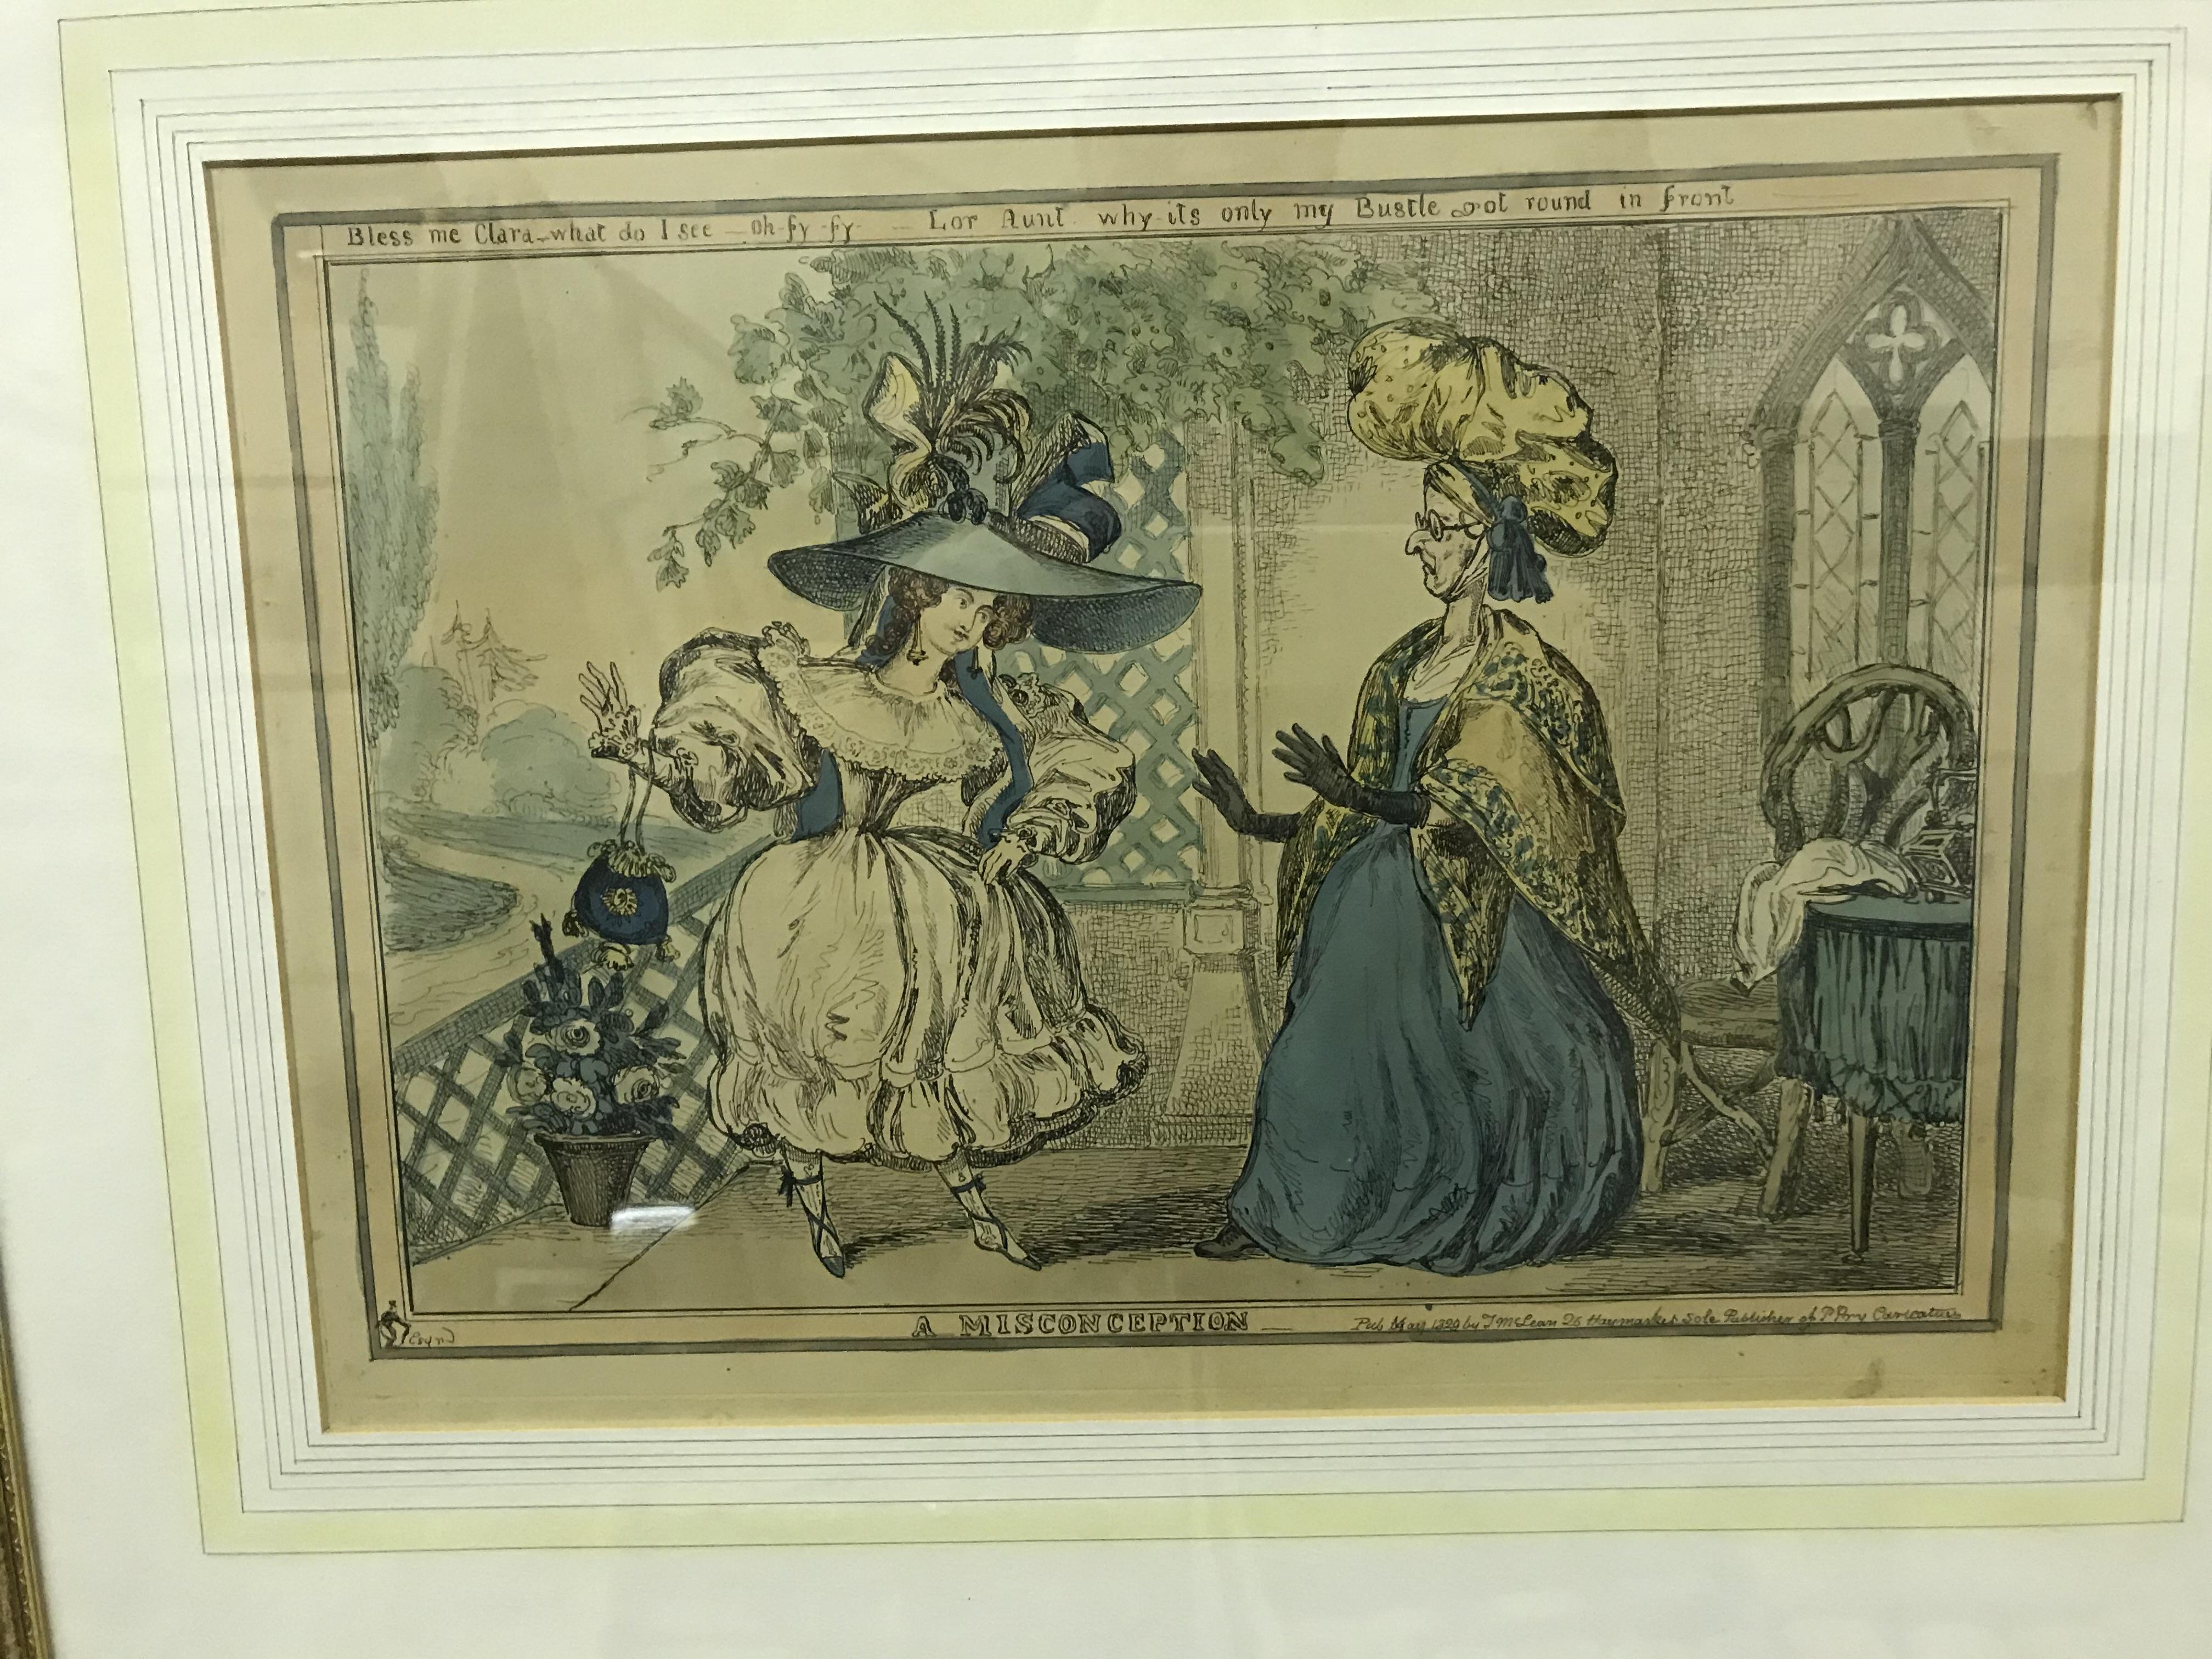 "PAUL PRY ""A Misconception"" colour etching pub. 1829 by T. M. McLean, plate size 26.5 cm x 38 cm - Image 2 of 4"